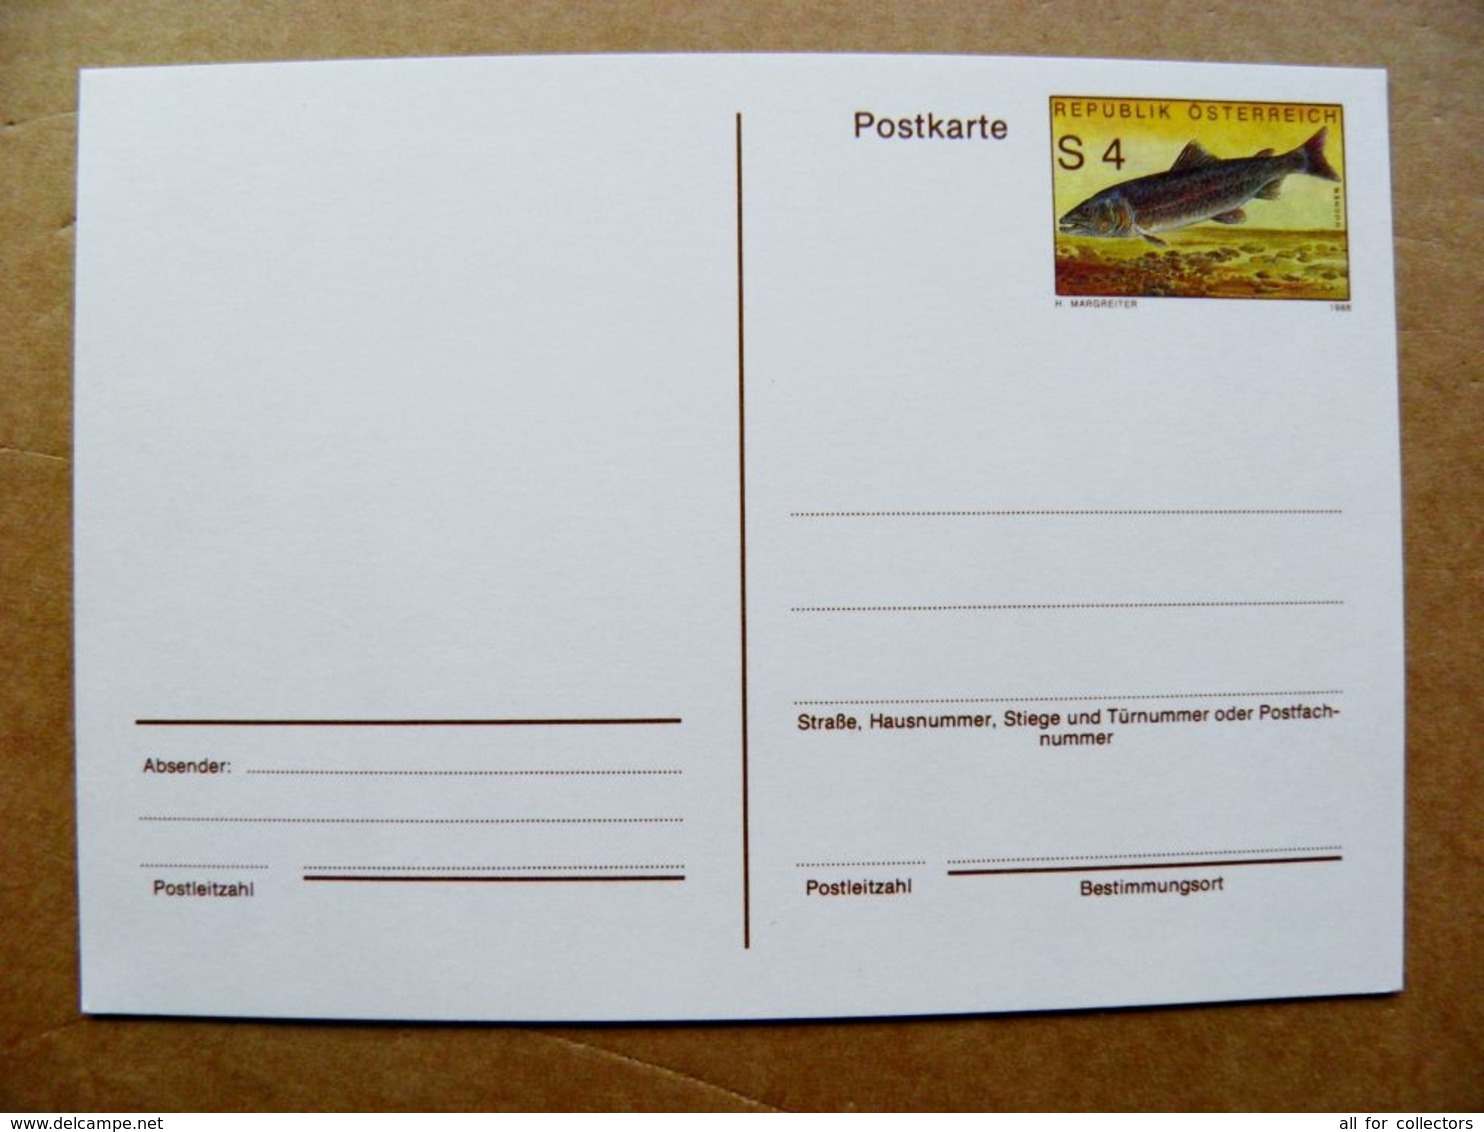 Postal Stationery Post Card Karte Austria Animals Fish Poisson 1988 - Entiers Postaux